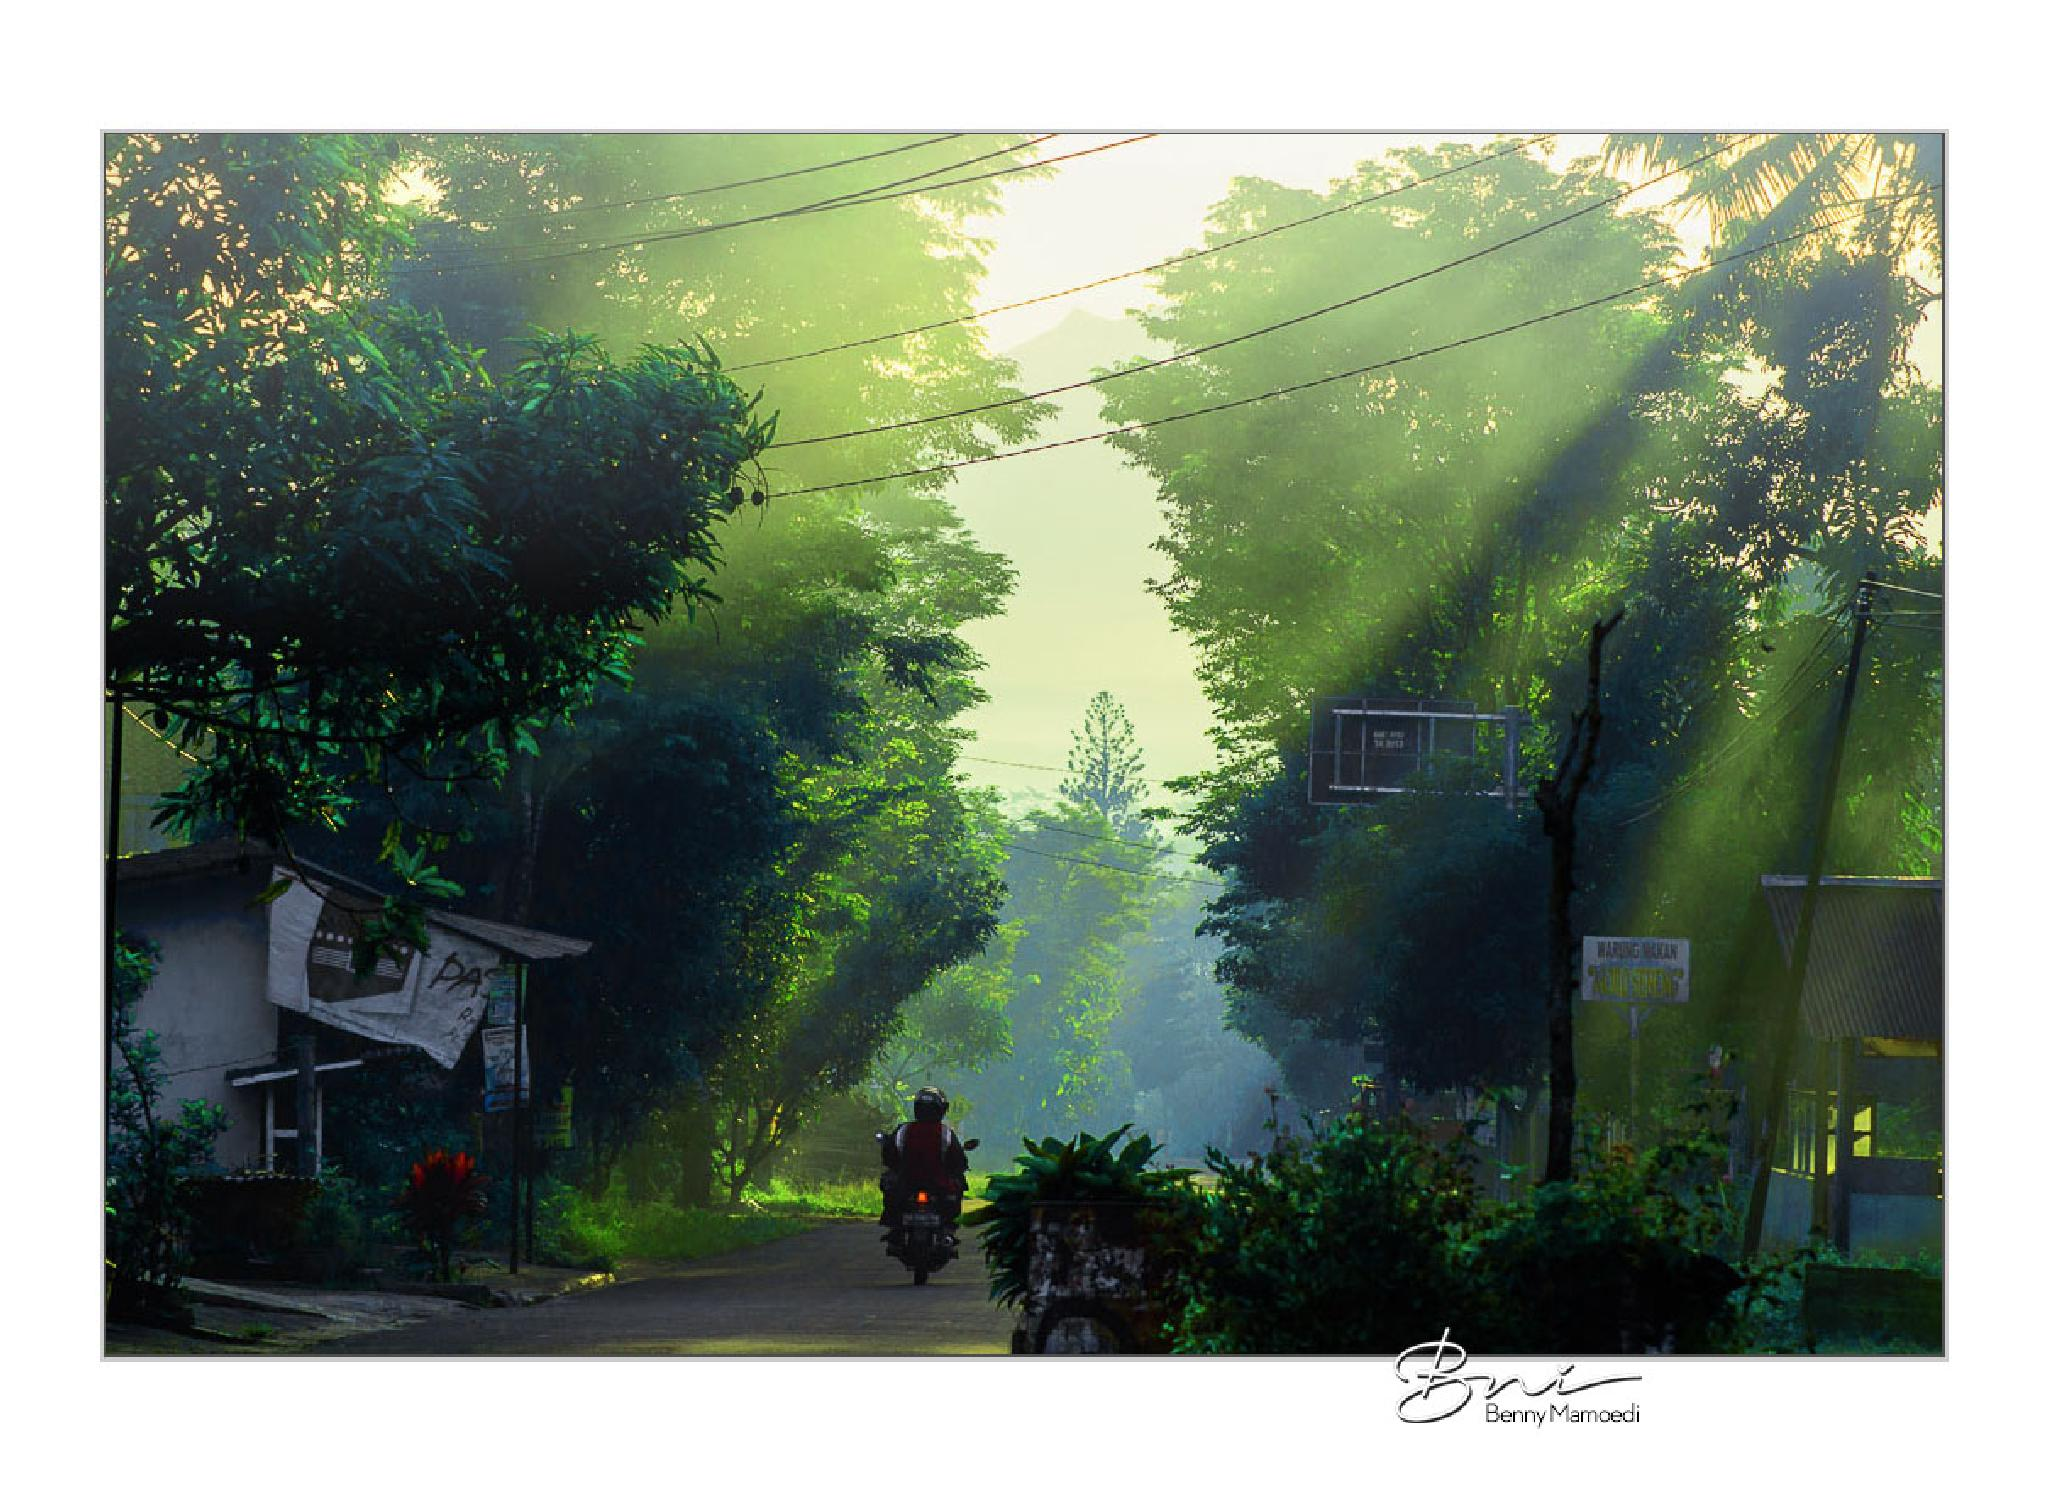 Morning has broken by Benny Mamoedi